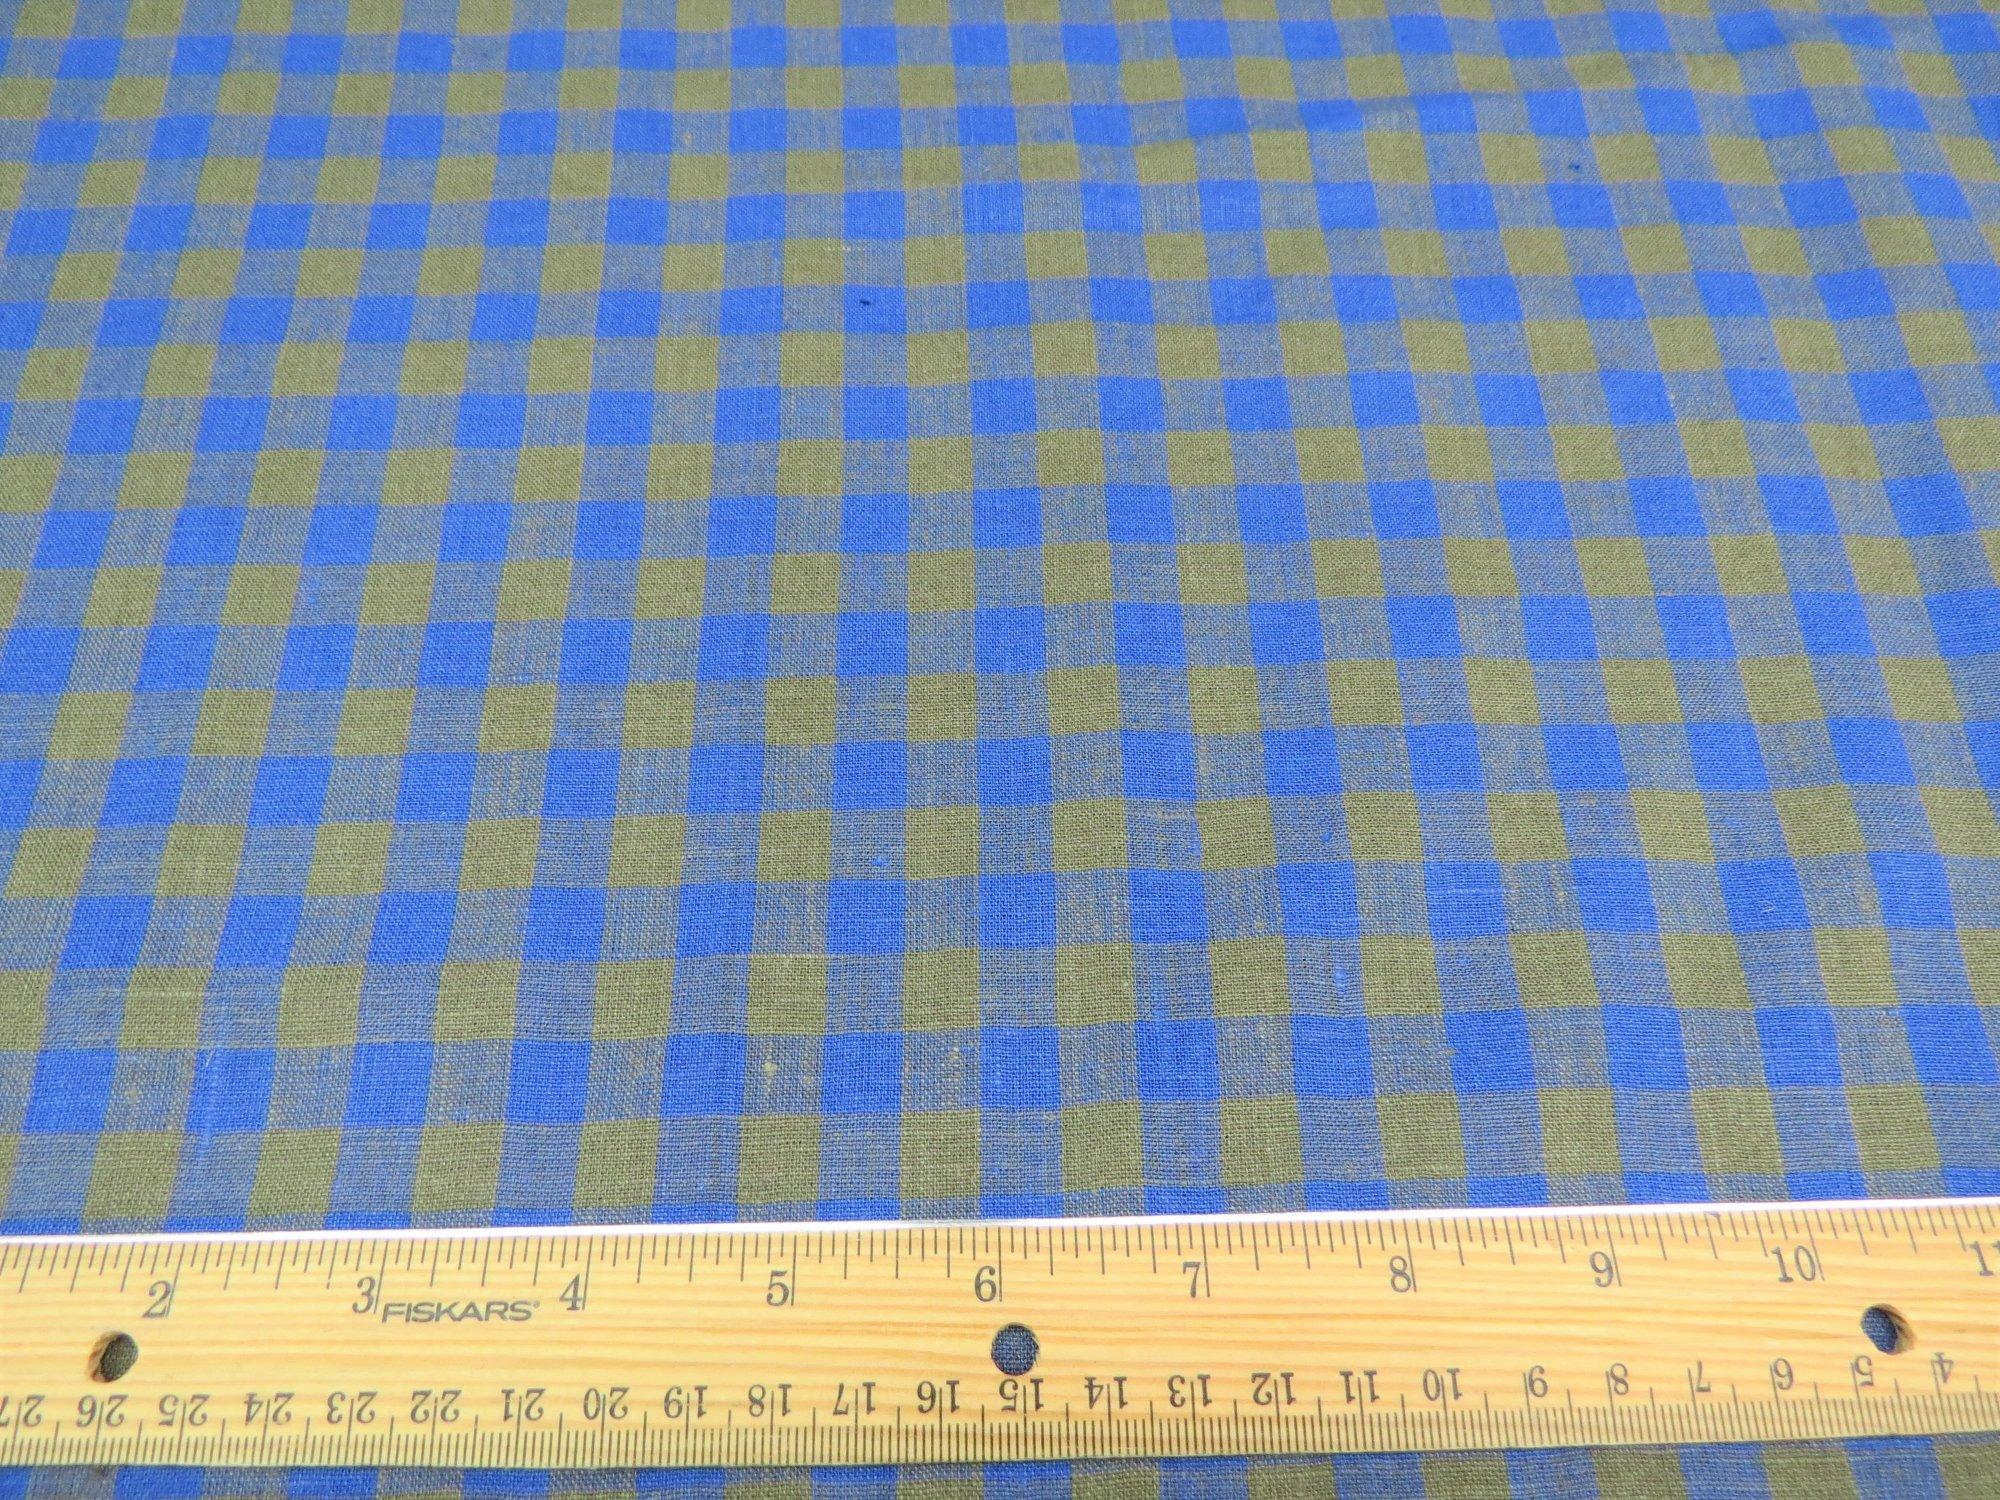 Cerulean Blue/Olive Green Plaid European Linen